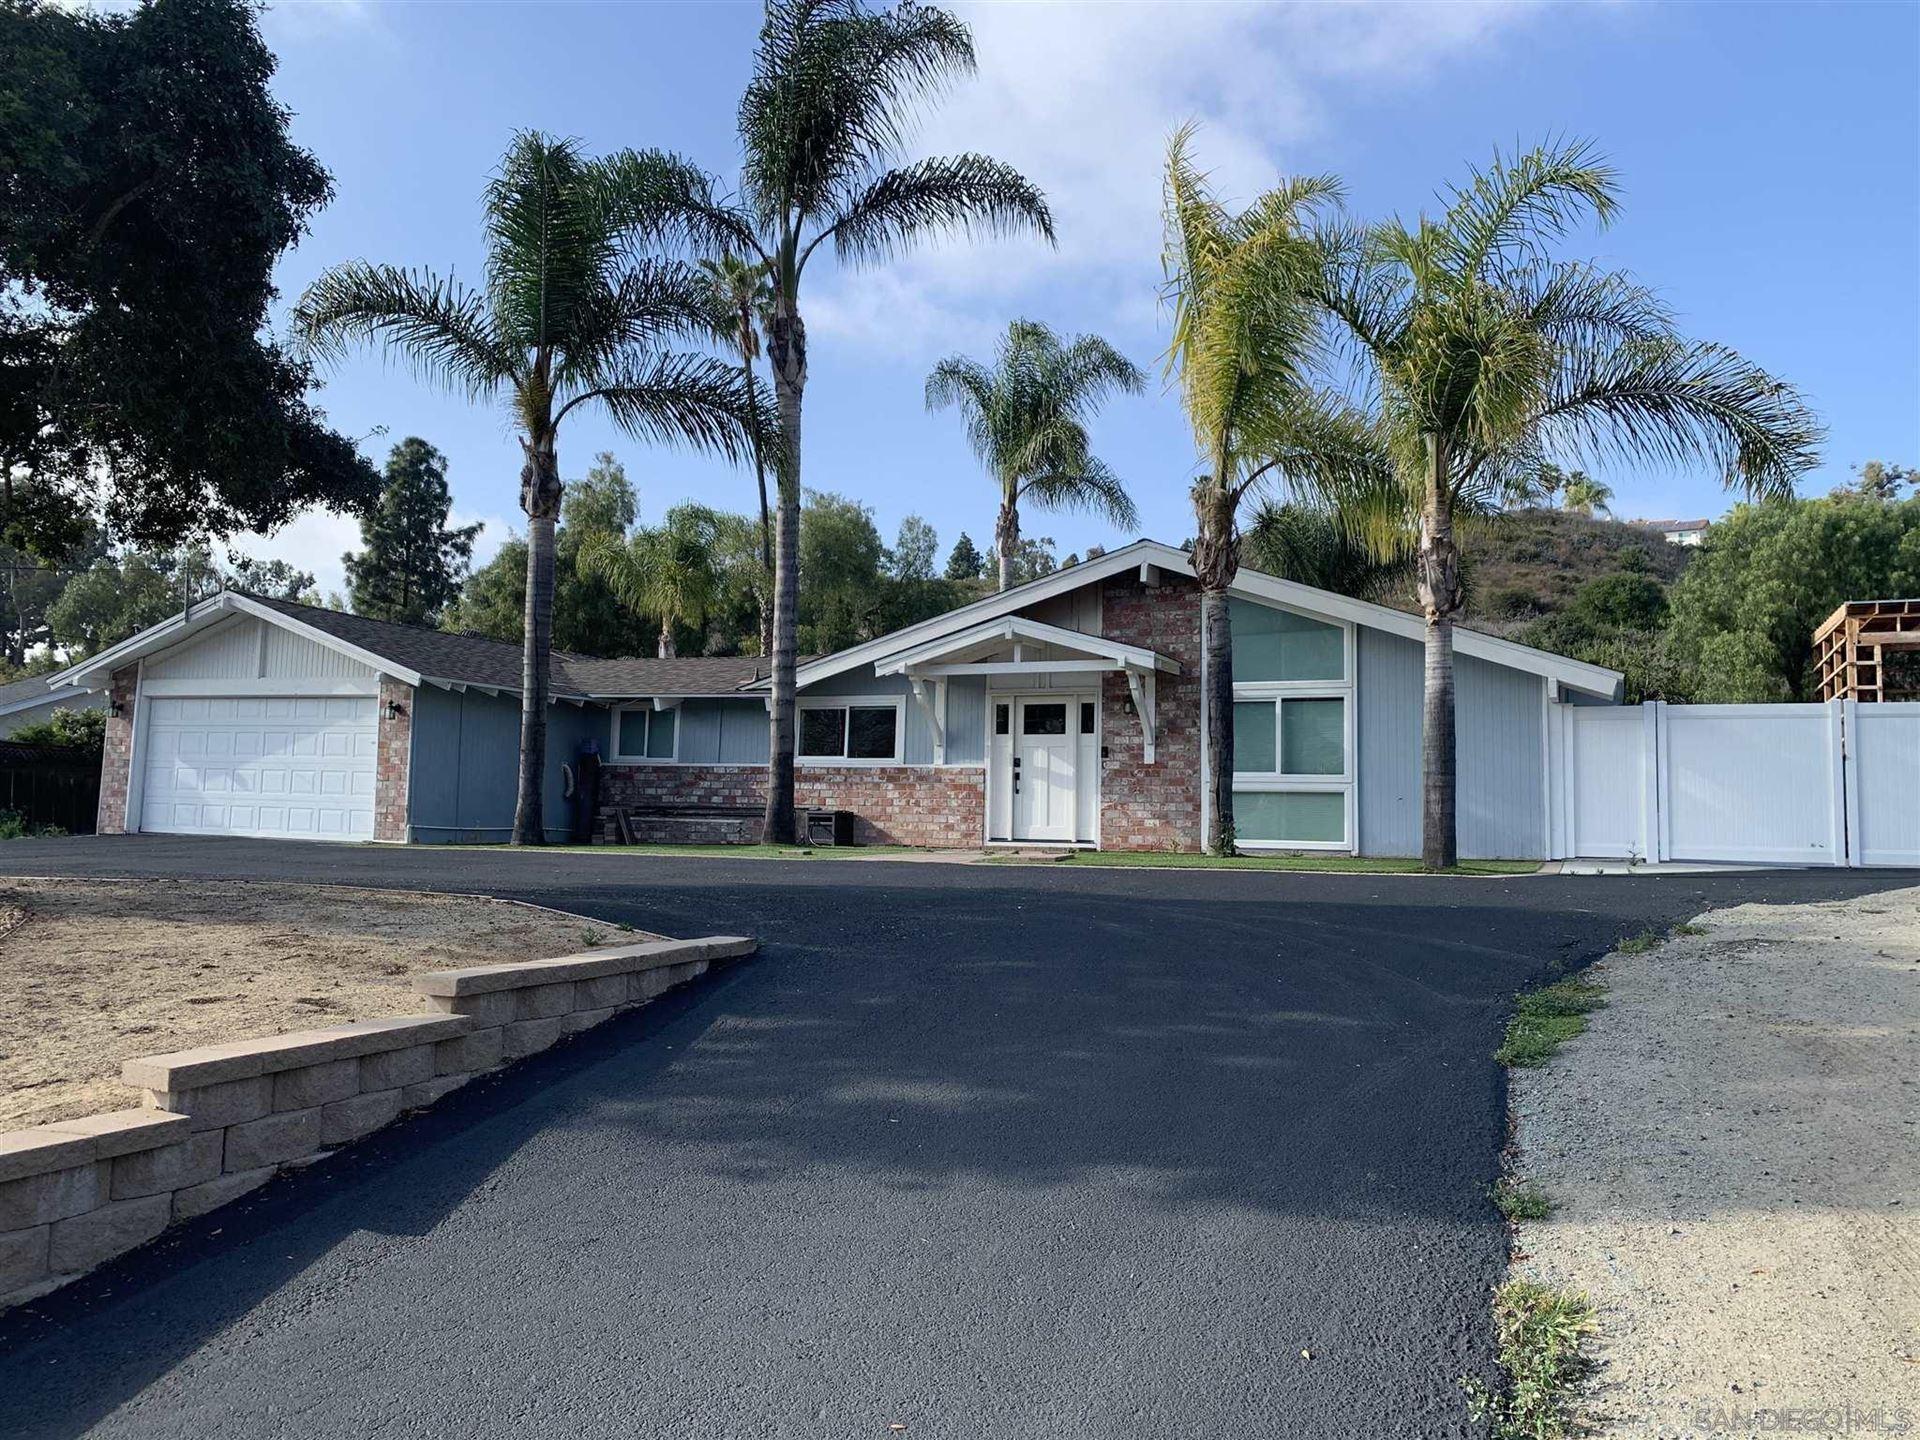 Photo of 4375 Acacia Ave, Bonita, CA 91902 (MLS # 210012462)